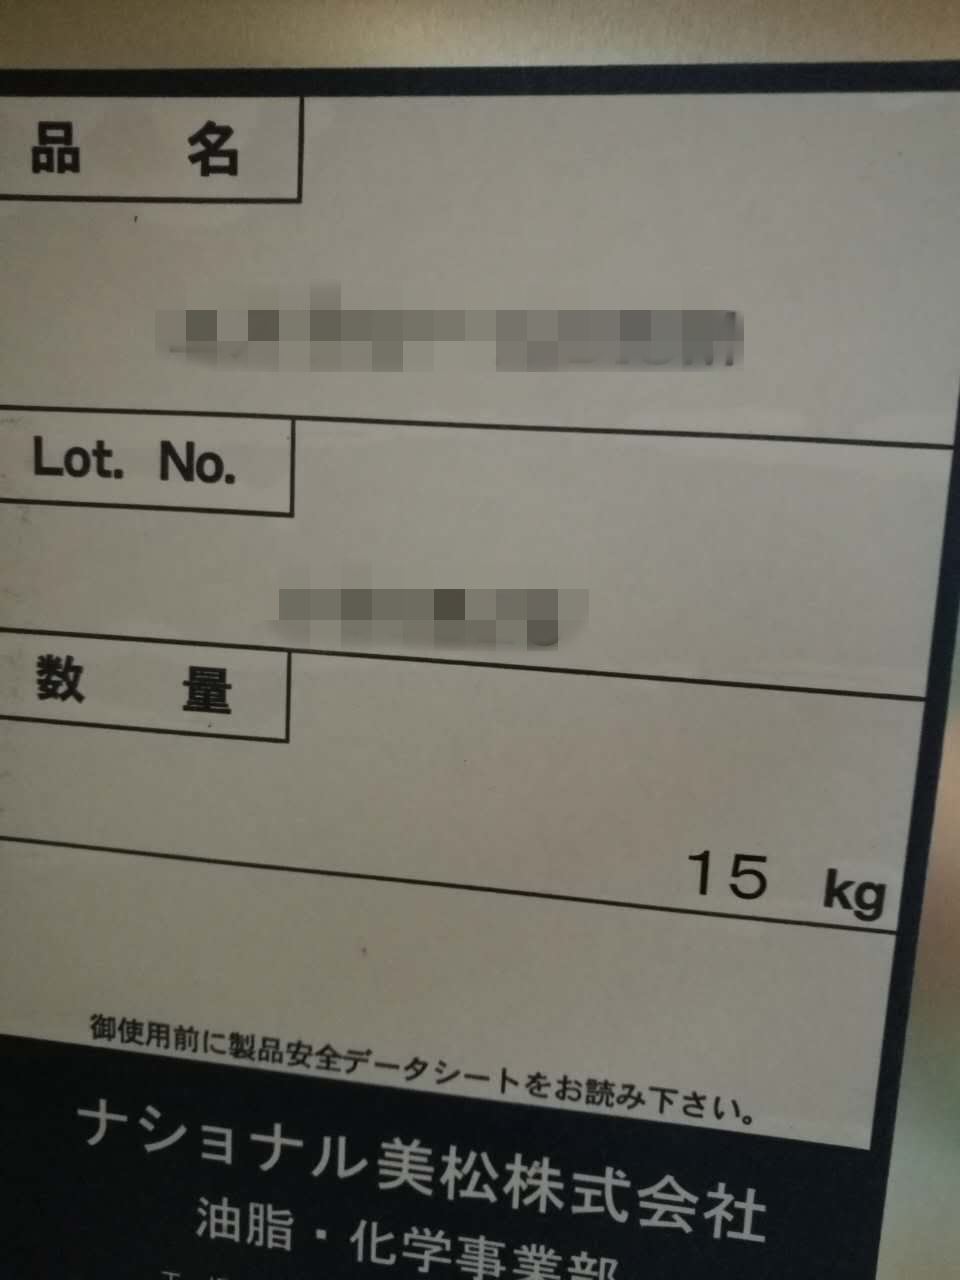 HR Oil TO-G  甘油三(乙基己酸)酯